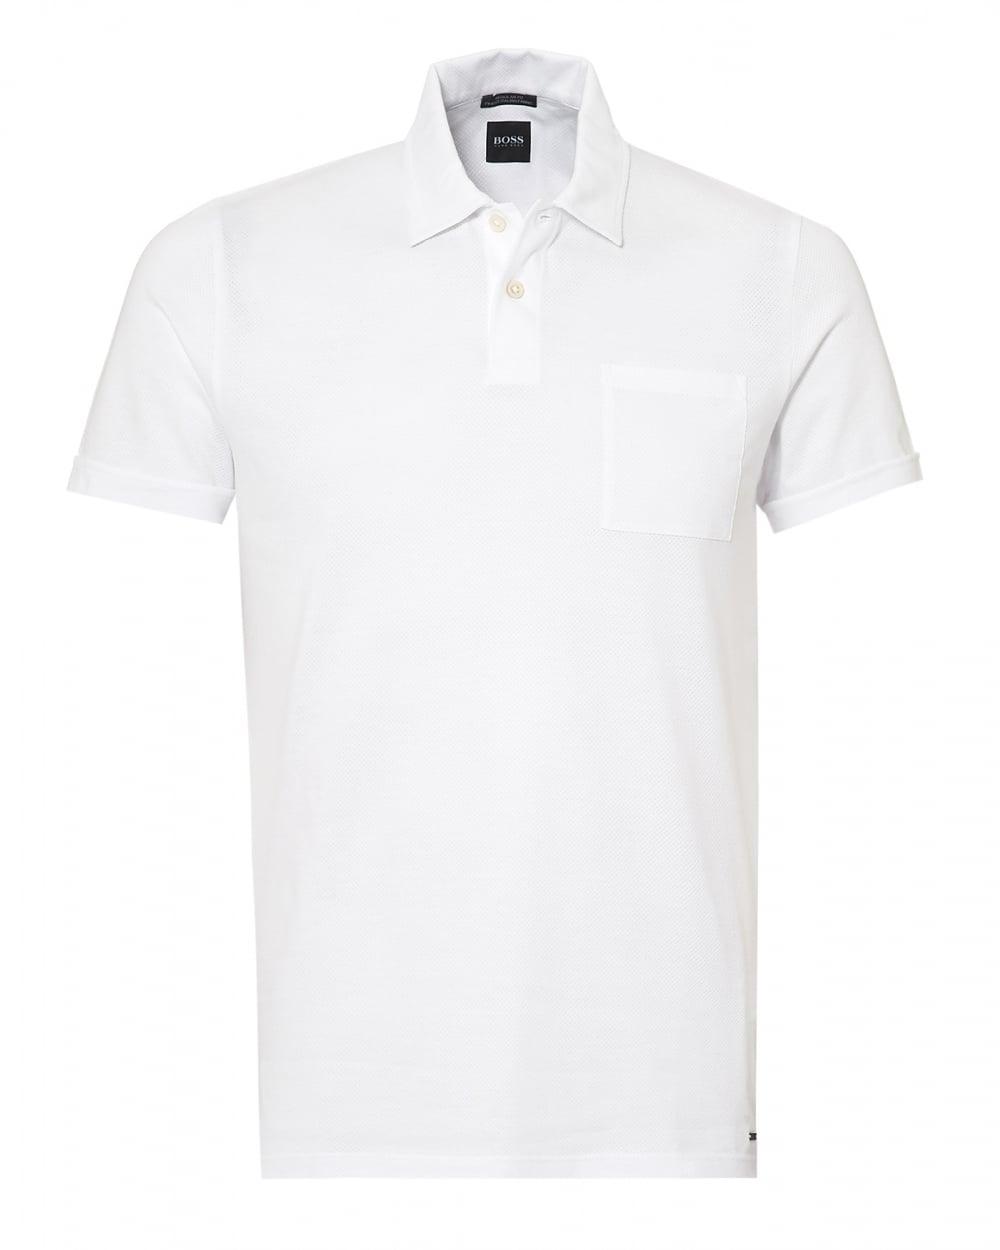 Hugo boss black mens paino polo shirt chest pocket white polo for Men s polo shirts with chest pocket